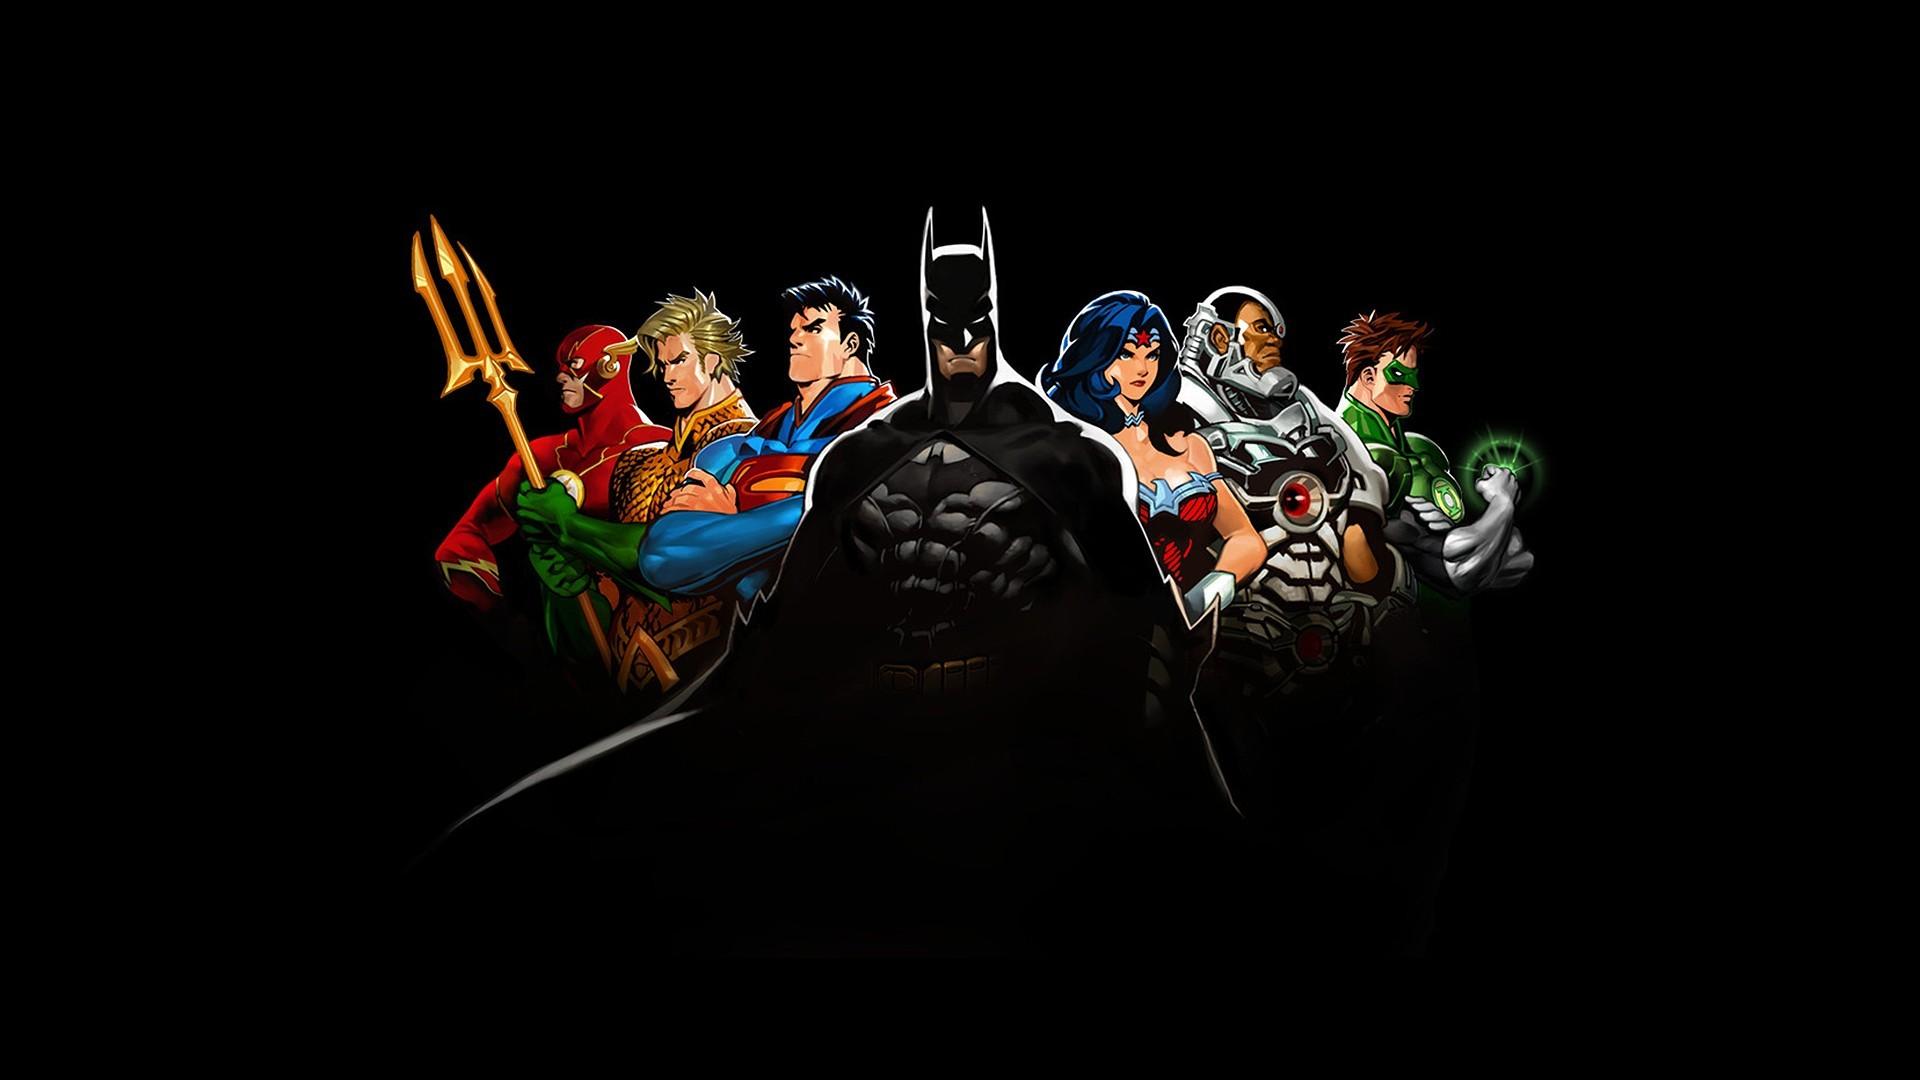 dc comics heroes comic hd wallpaper 1920x1080 5068jpg 1920x1080